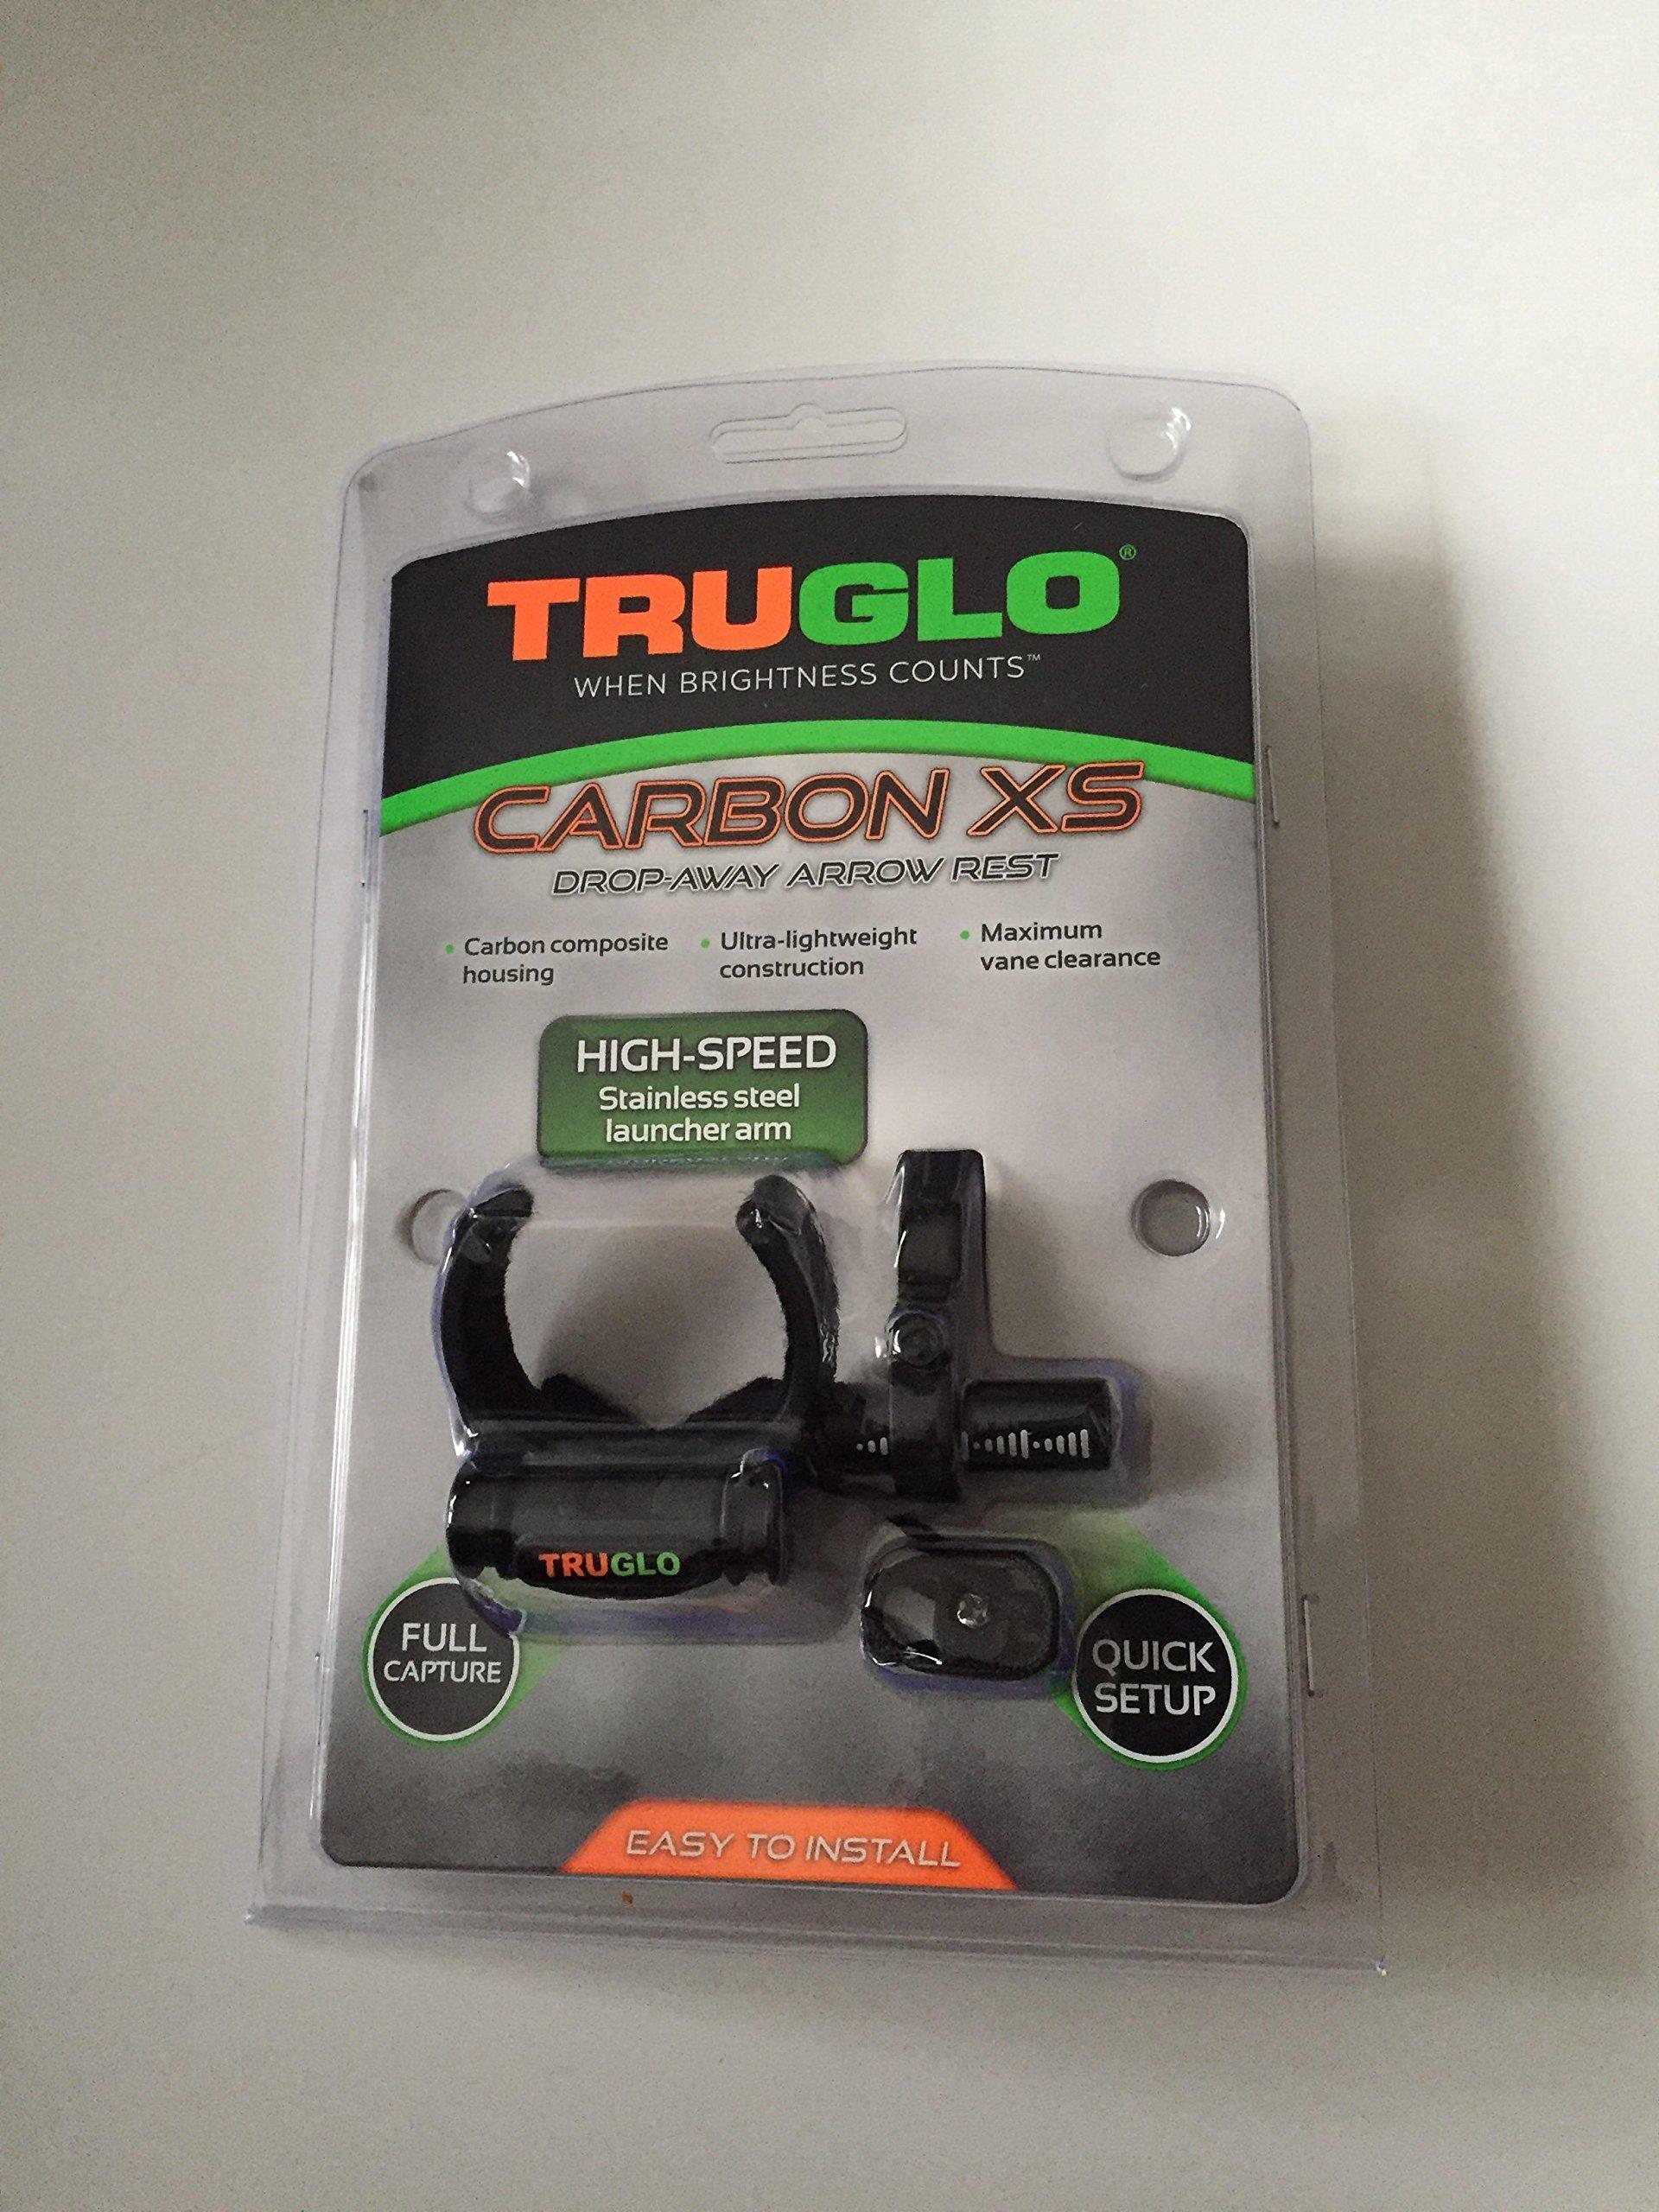 TRUGLO Carbon XS Drop Away Arrow Rest